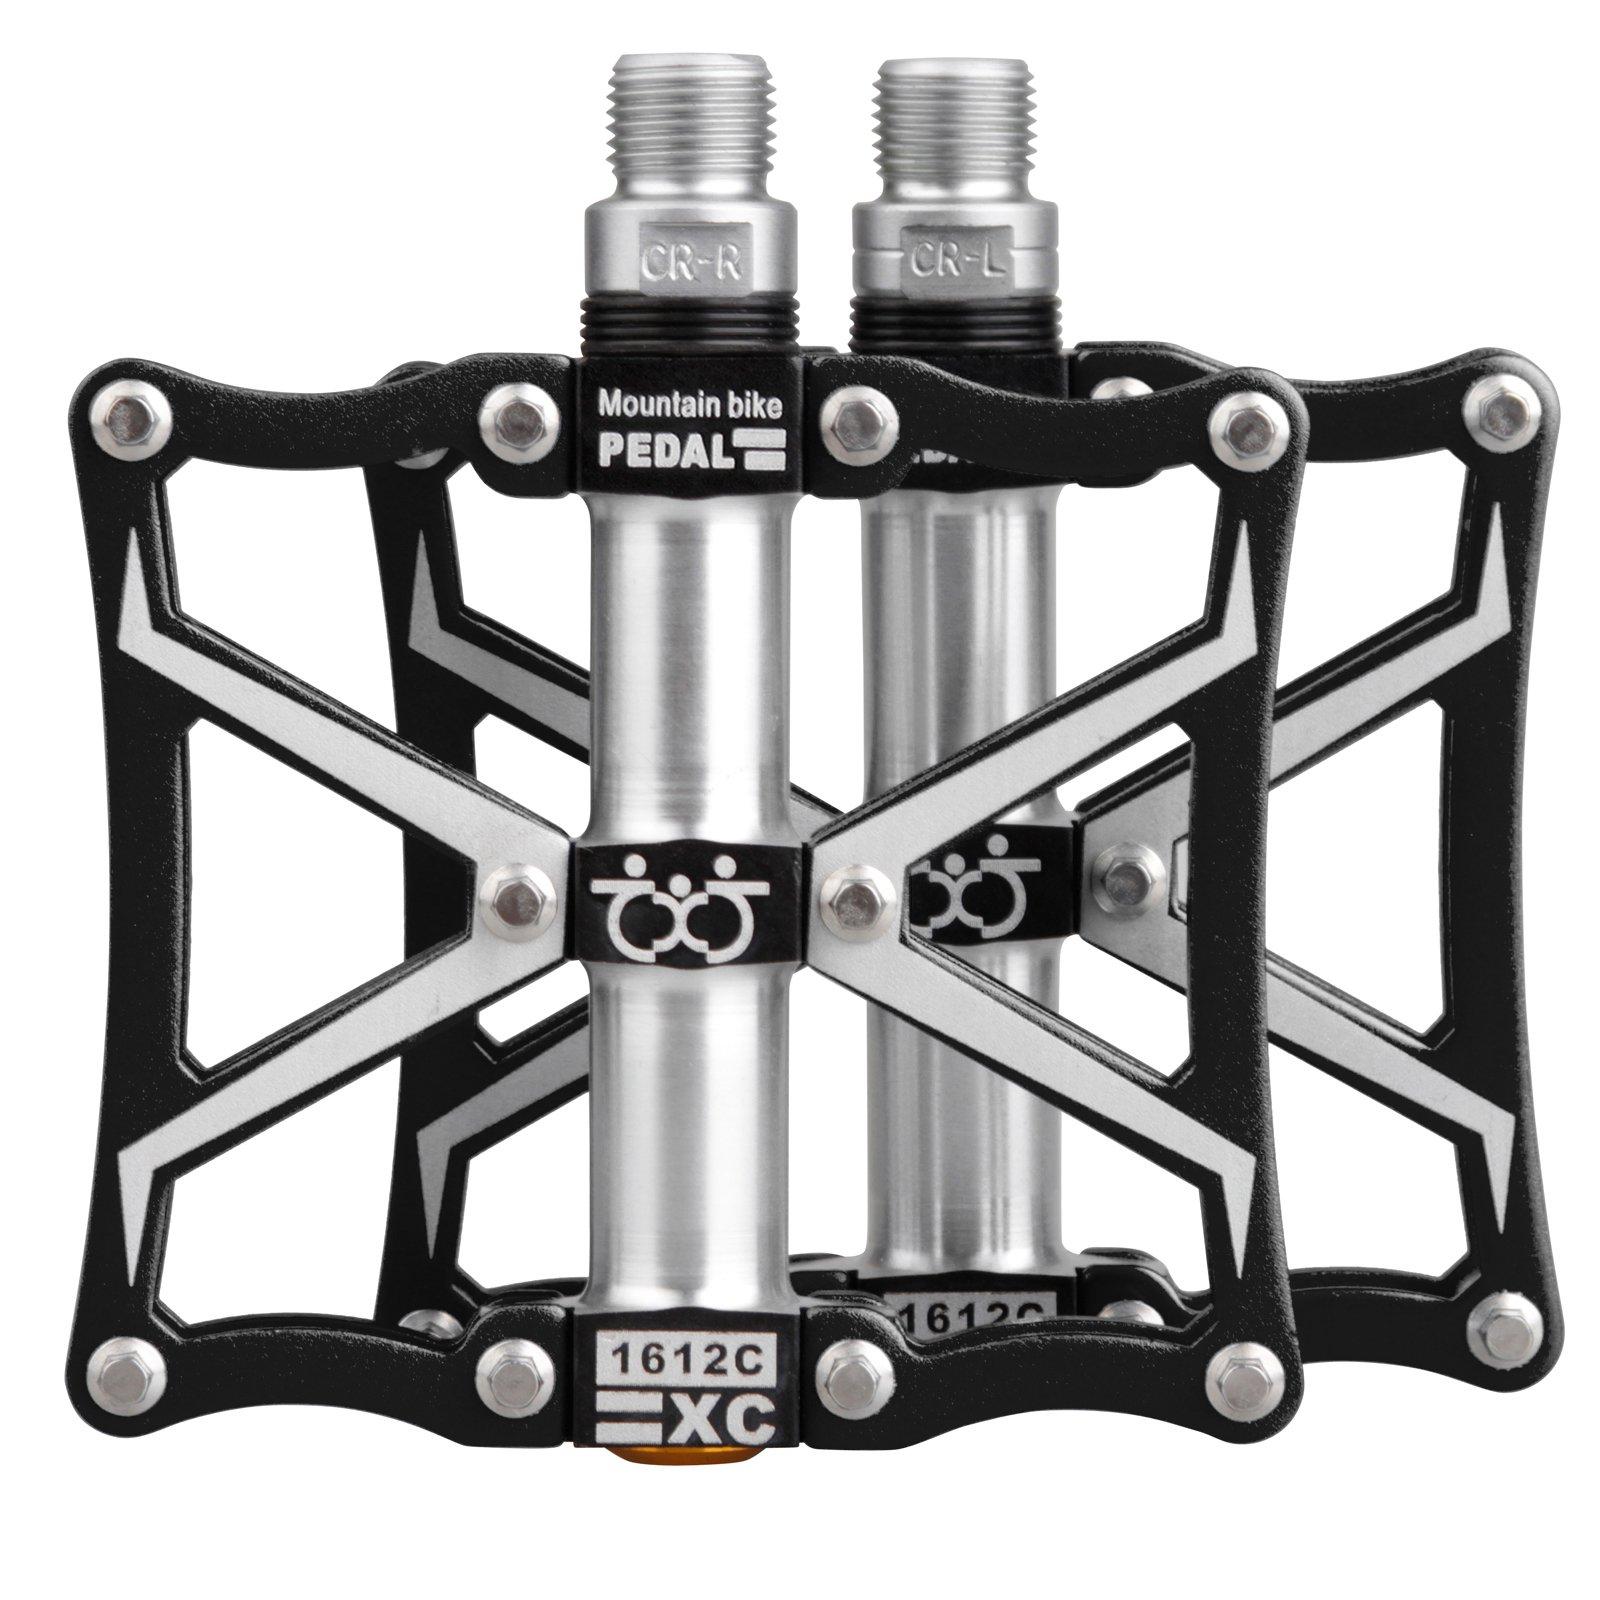 TXJ Mountain Bike Pedals Platform Bike Pedals Aluminum Alloy 9//16 CNC Ultra Sealed Bearing Bicycle Bike Pedals